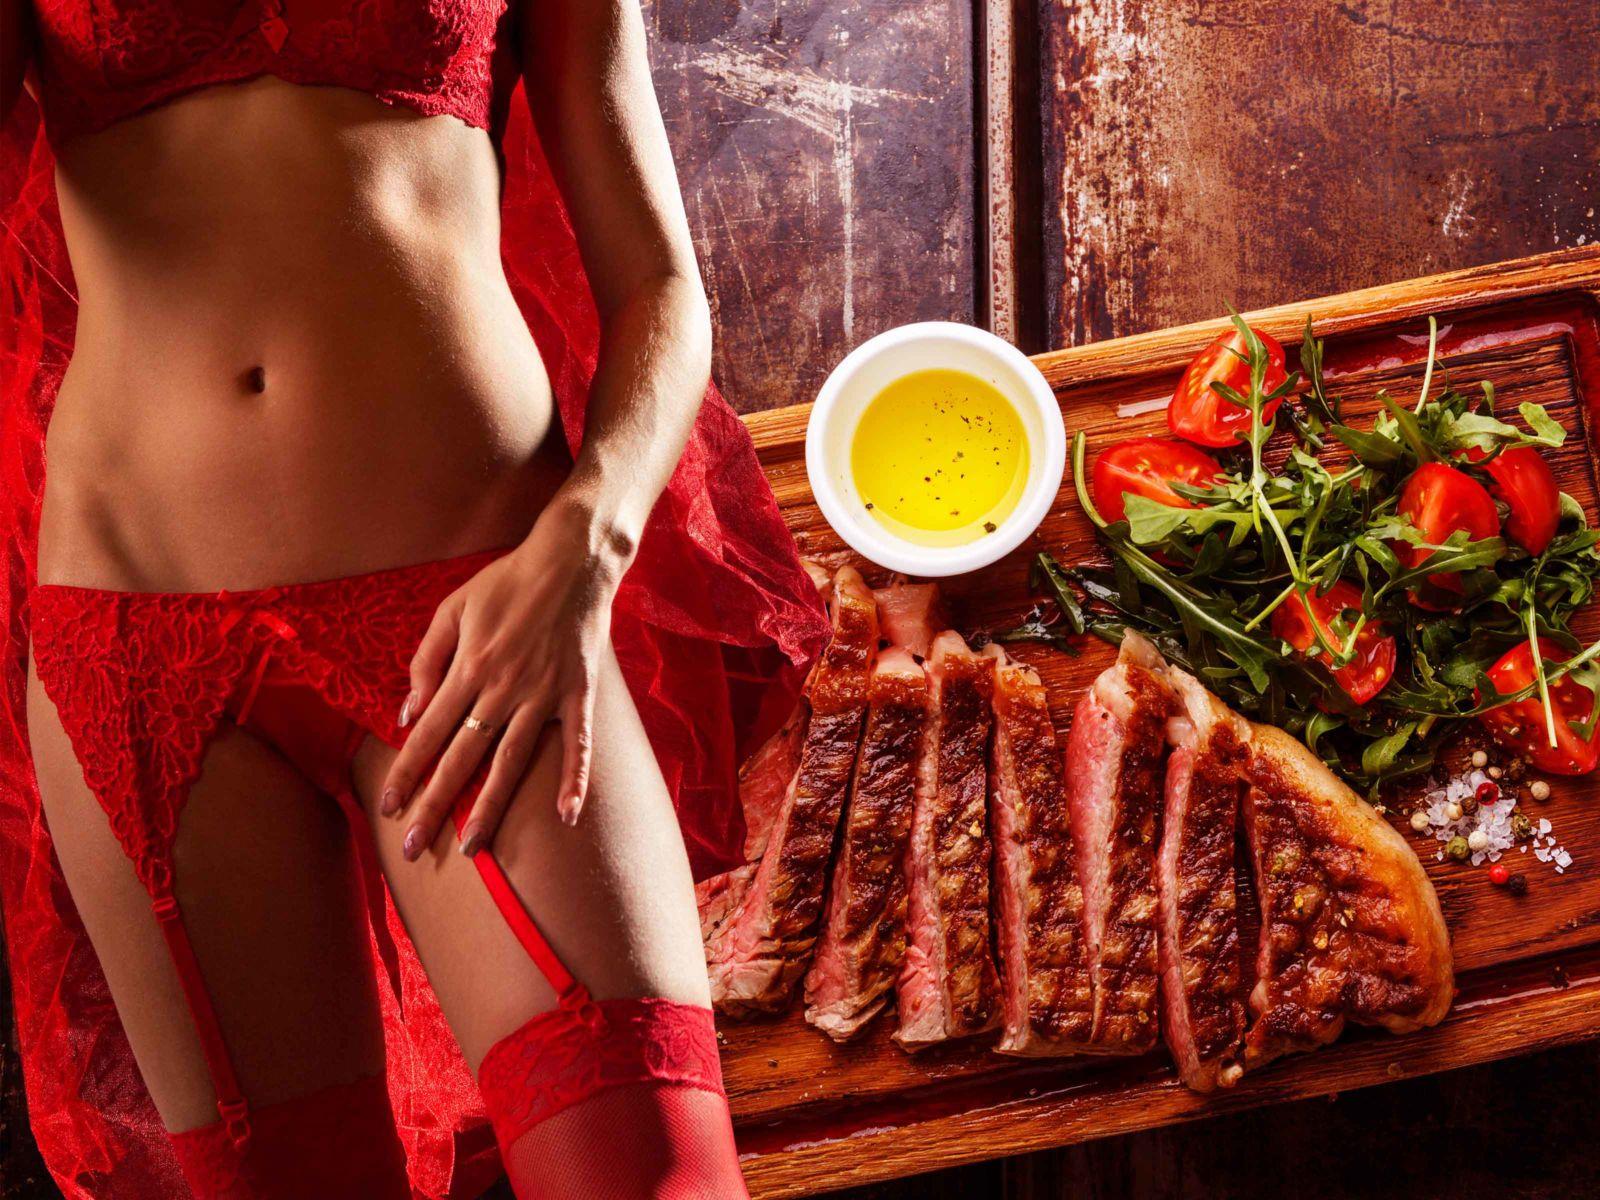 Steak Dinner and Erotic Show